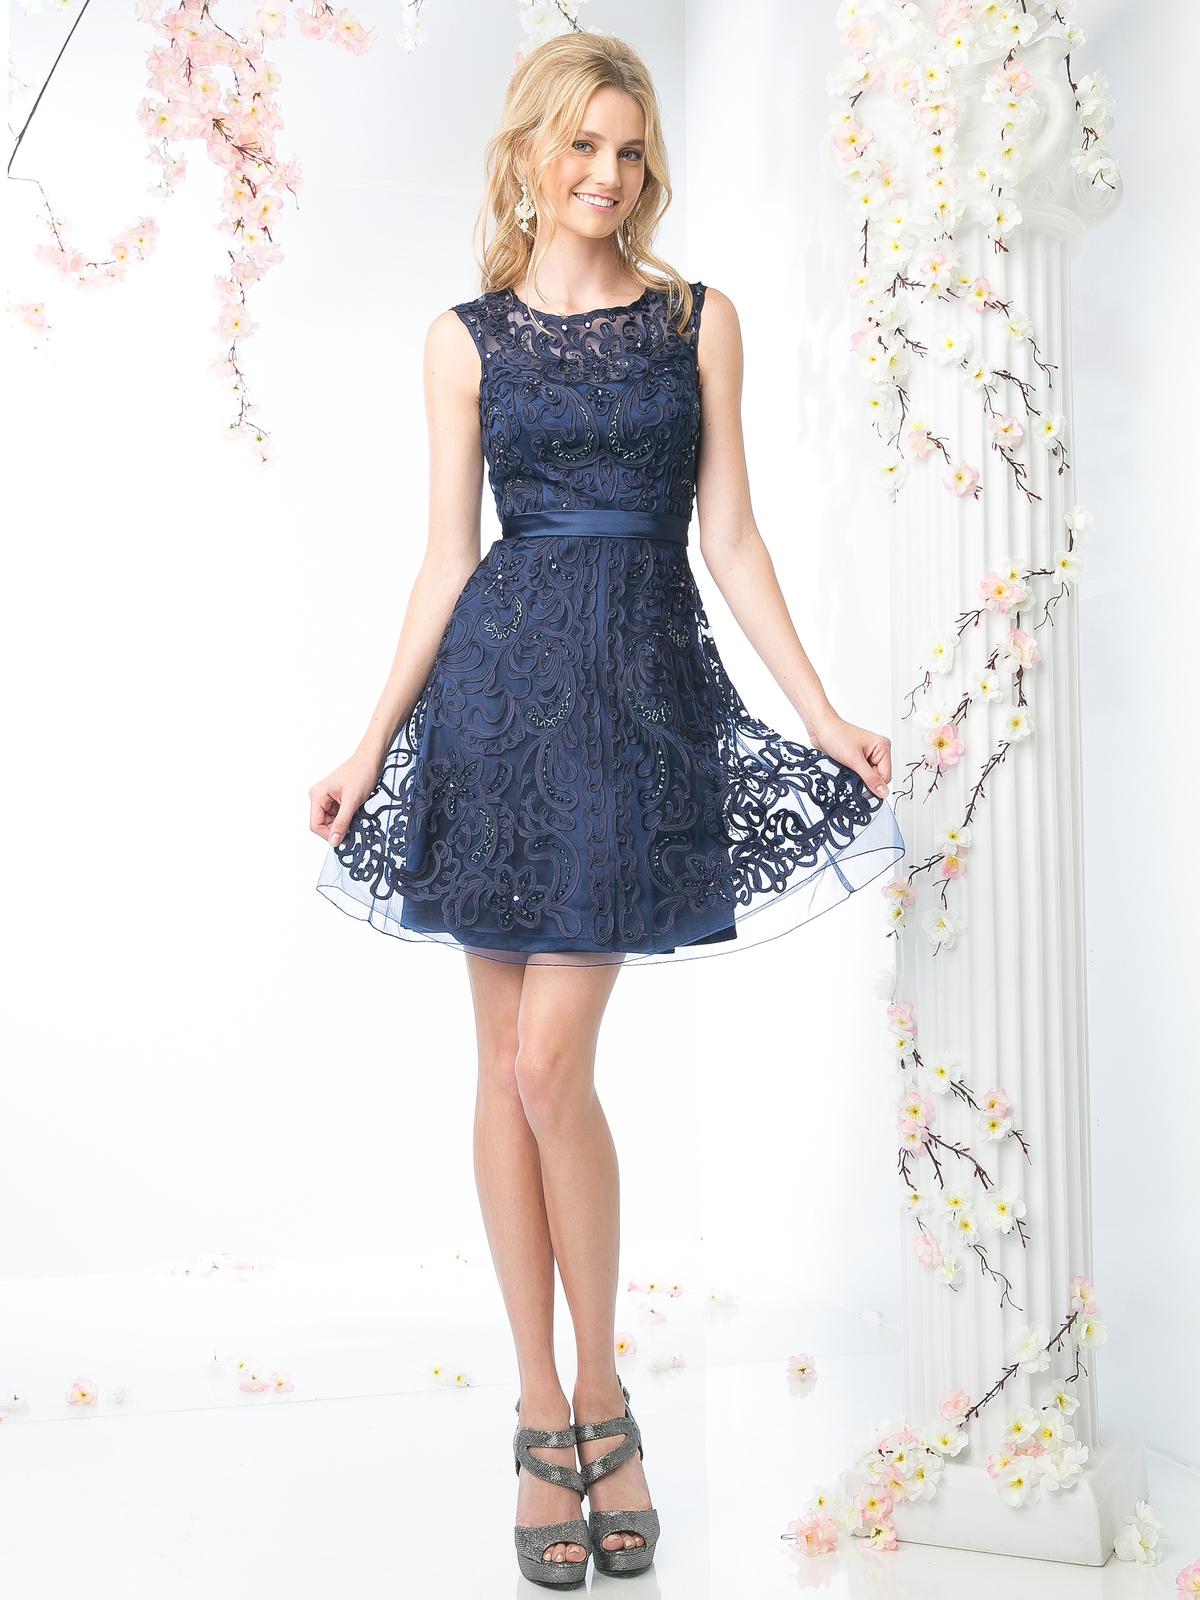 Sleeveless Cocktail Dresses